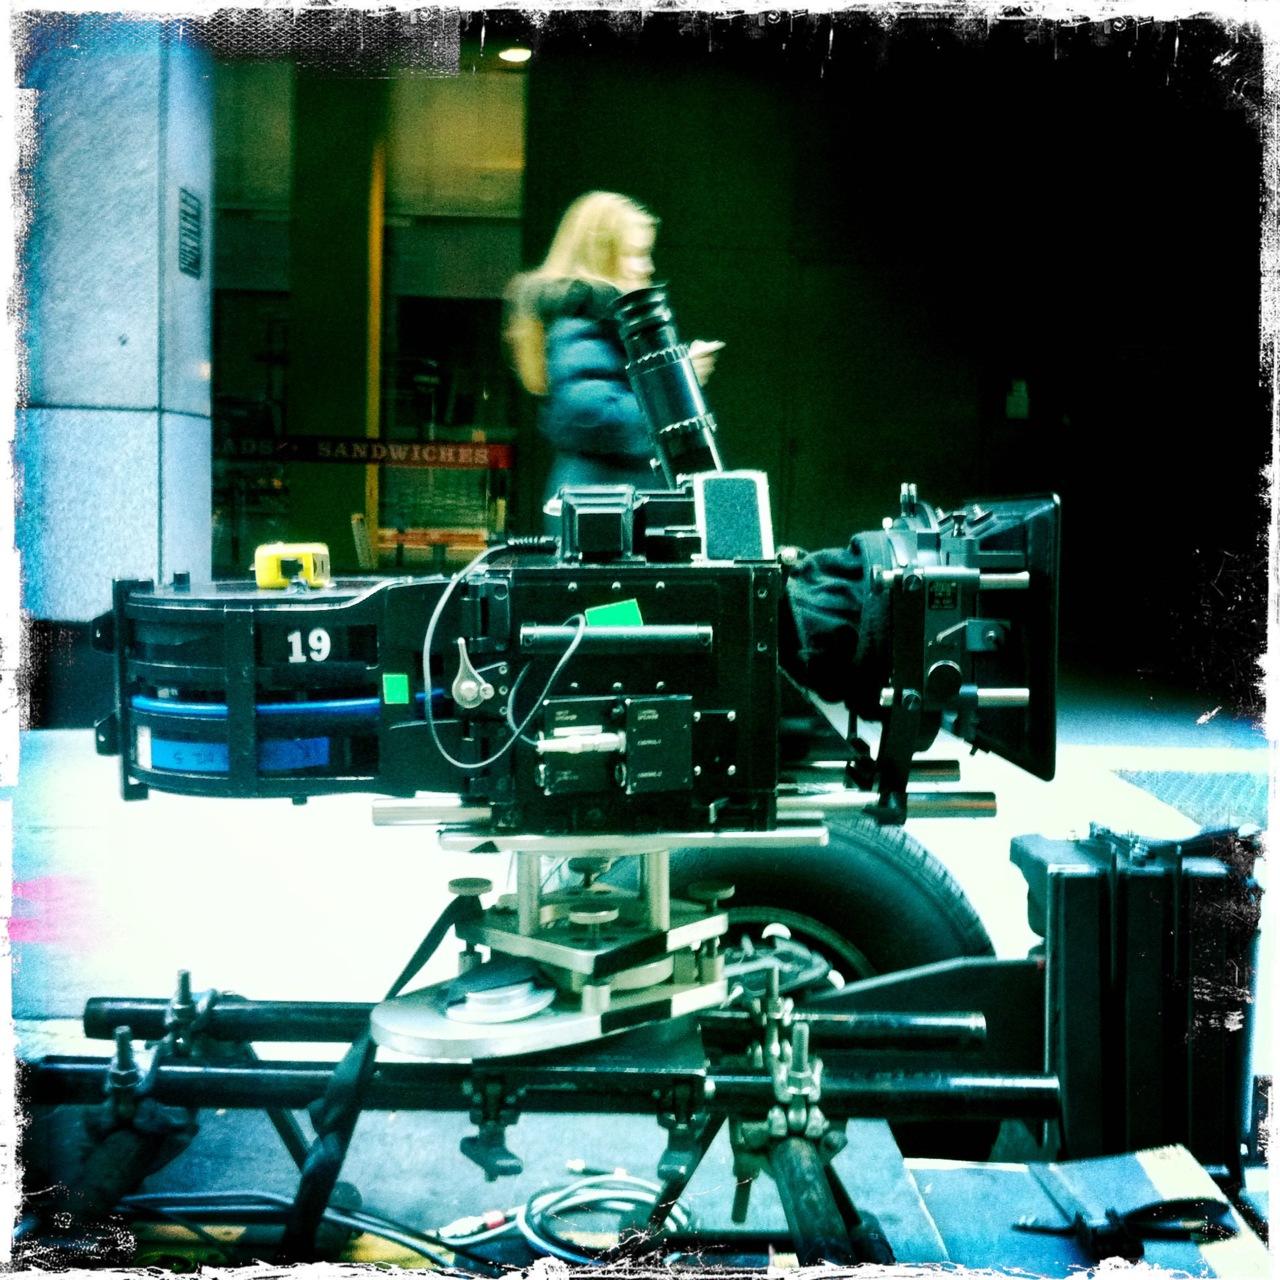 Batcam 1 on set of Magnus Rex.